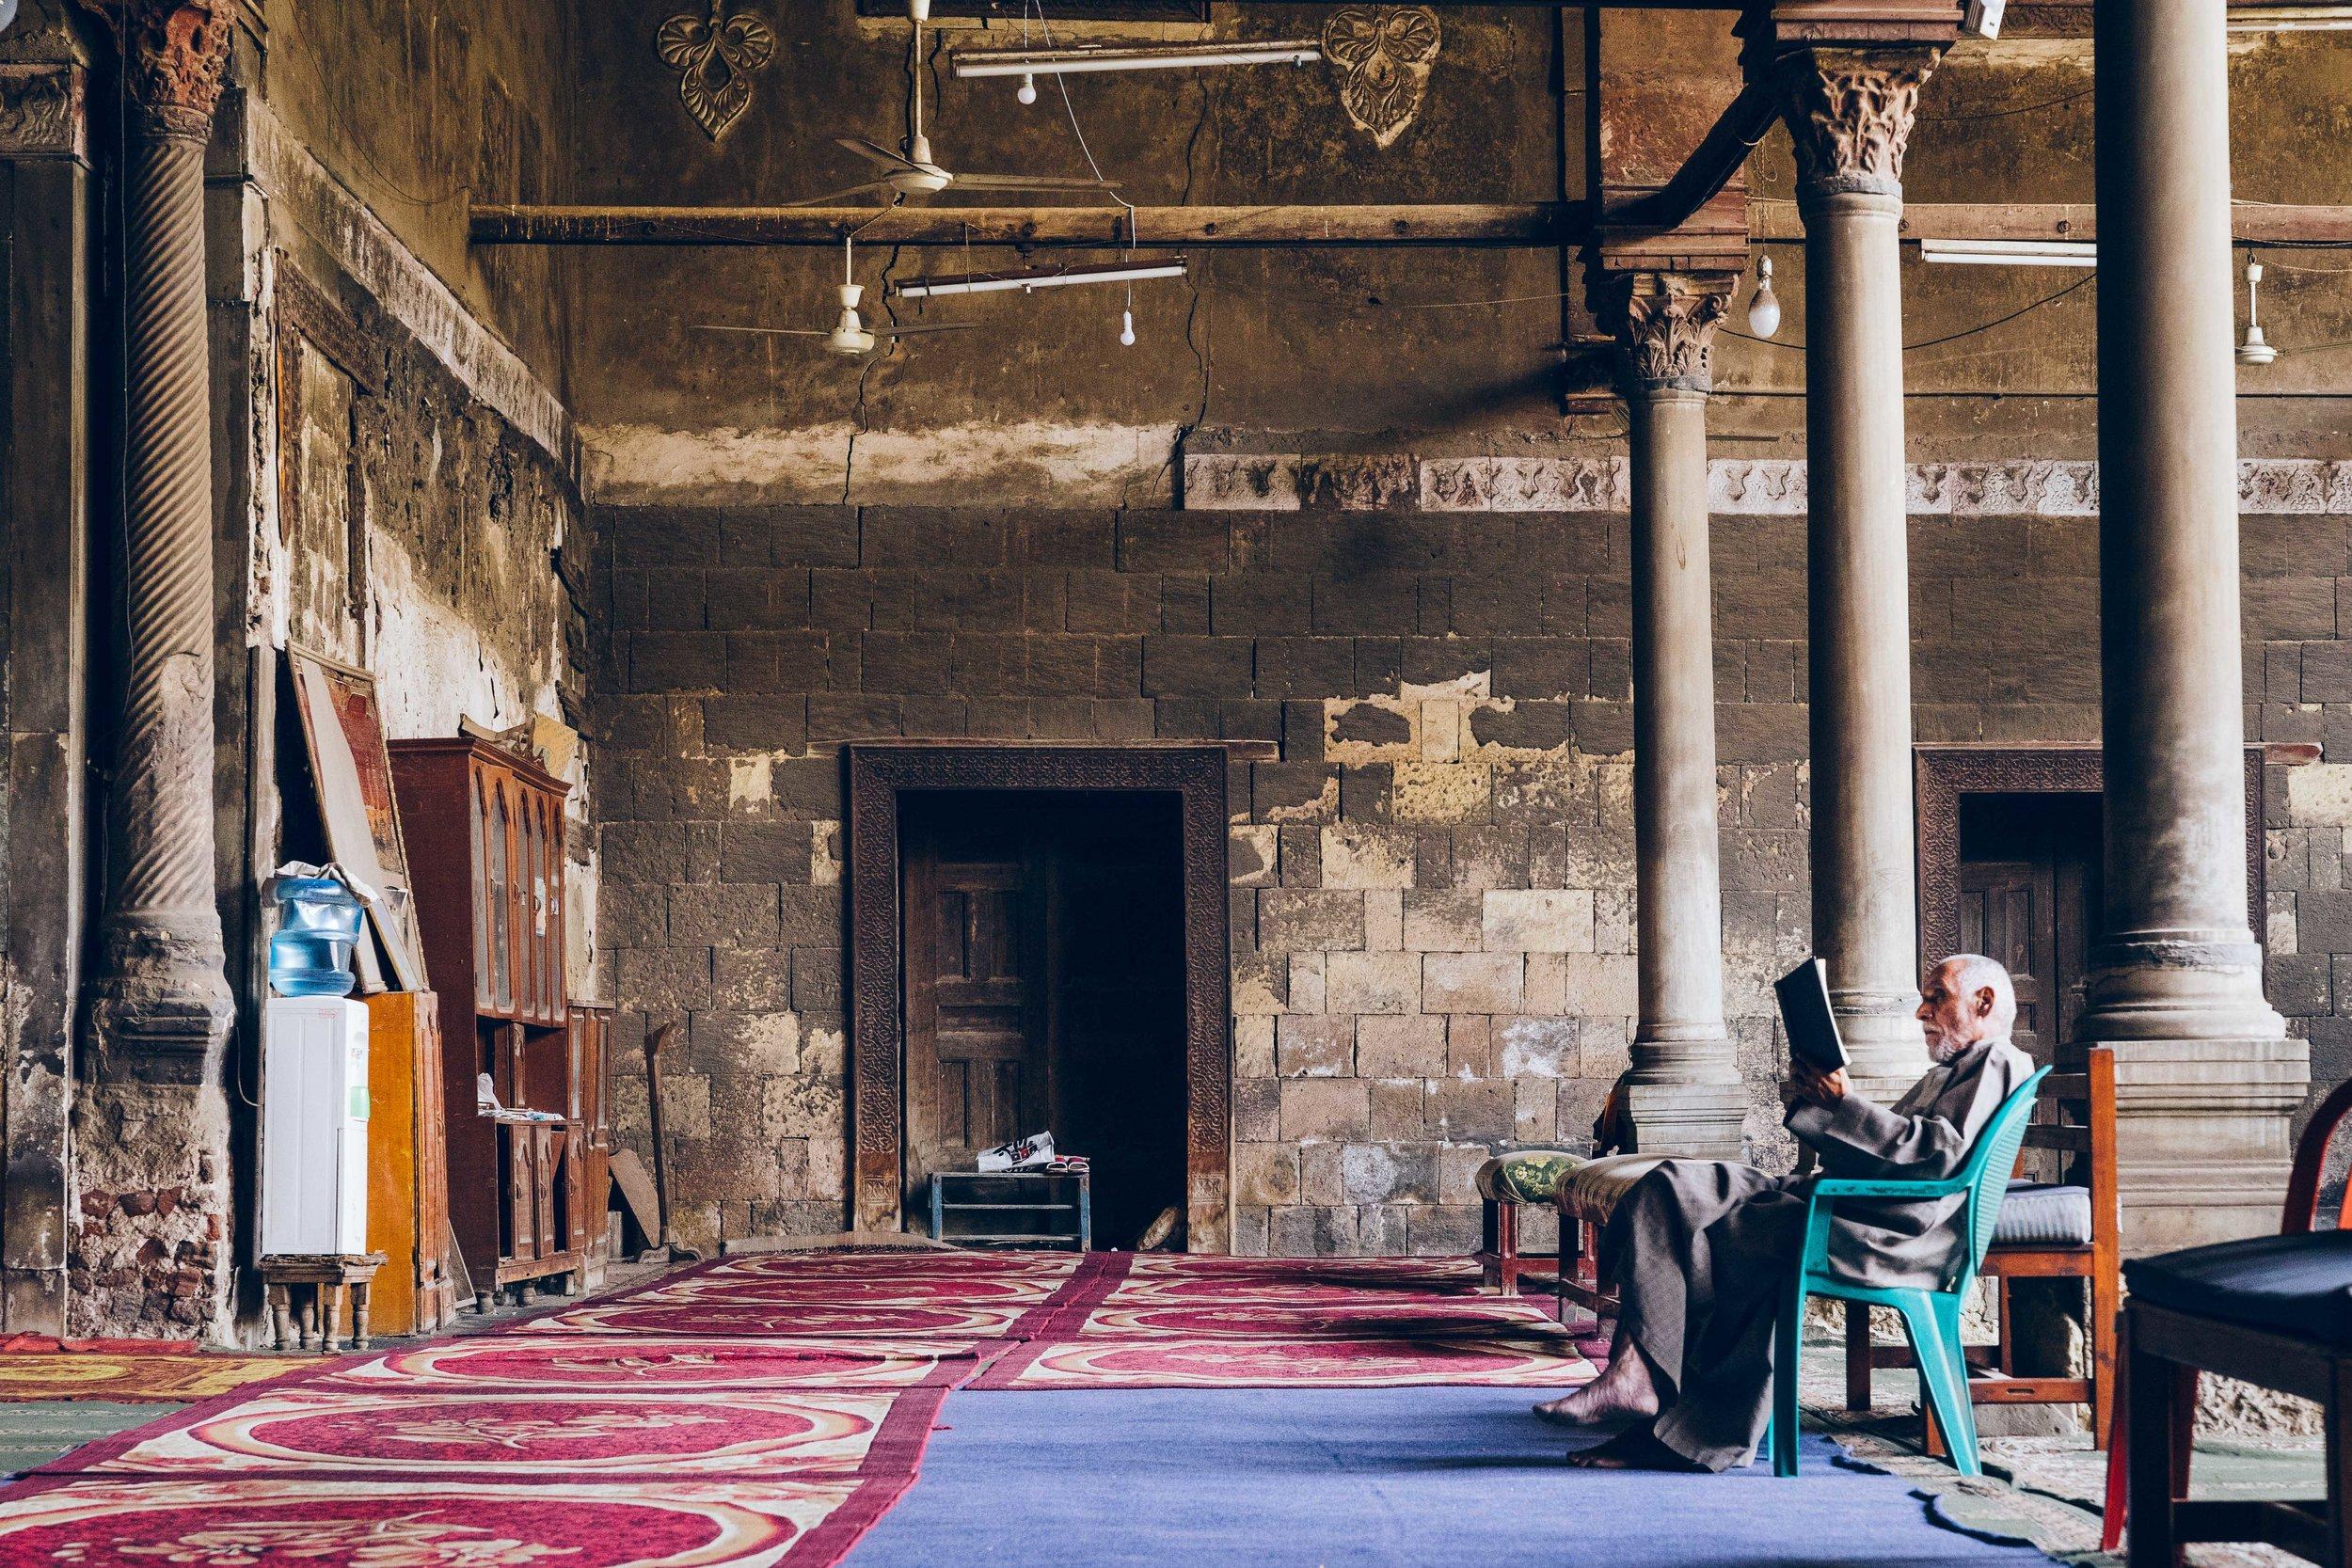 Inside the al-Maridani Mosque